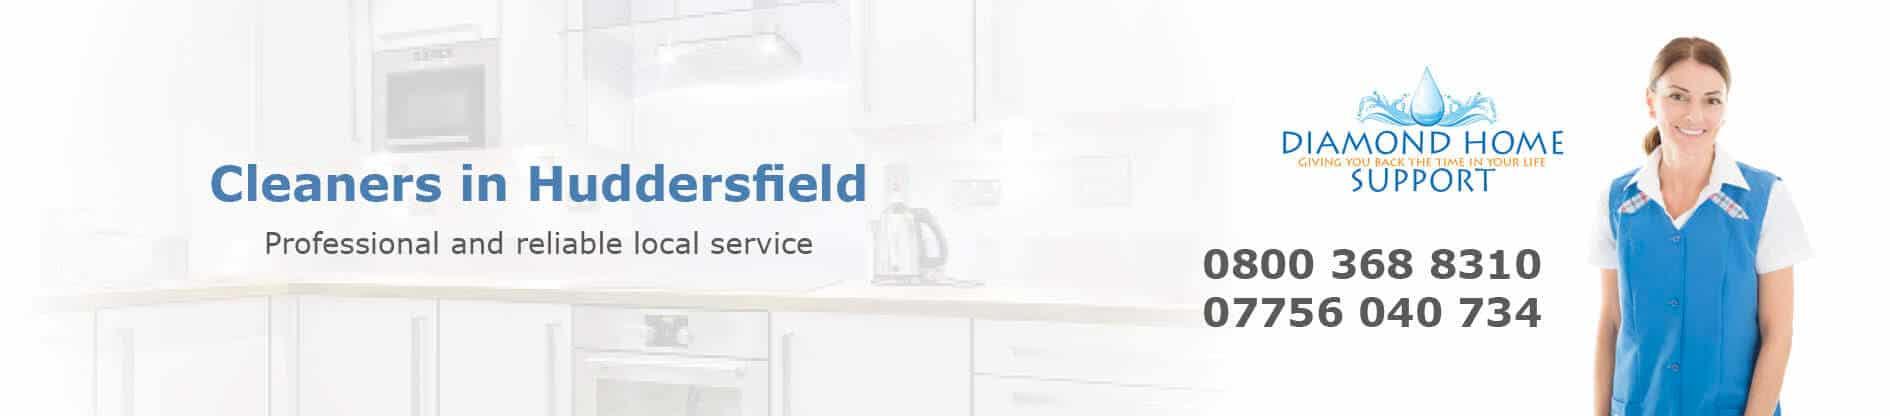 Cleaners in Huddersfield